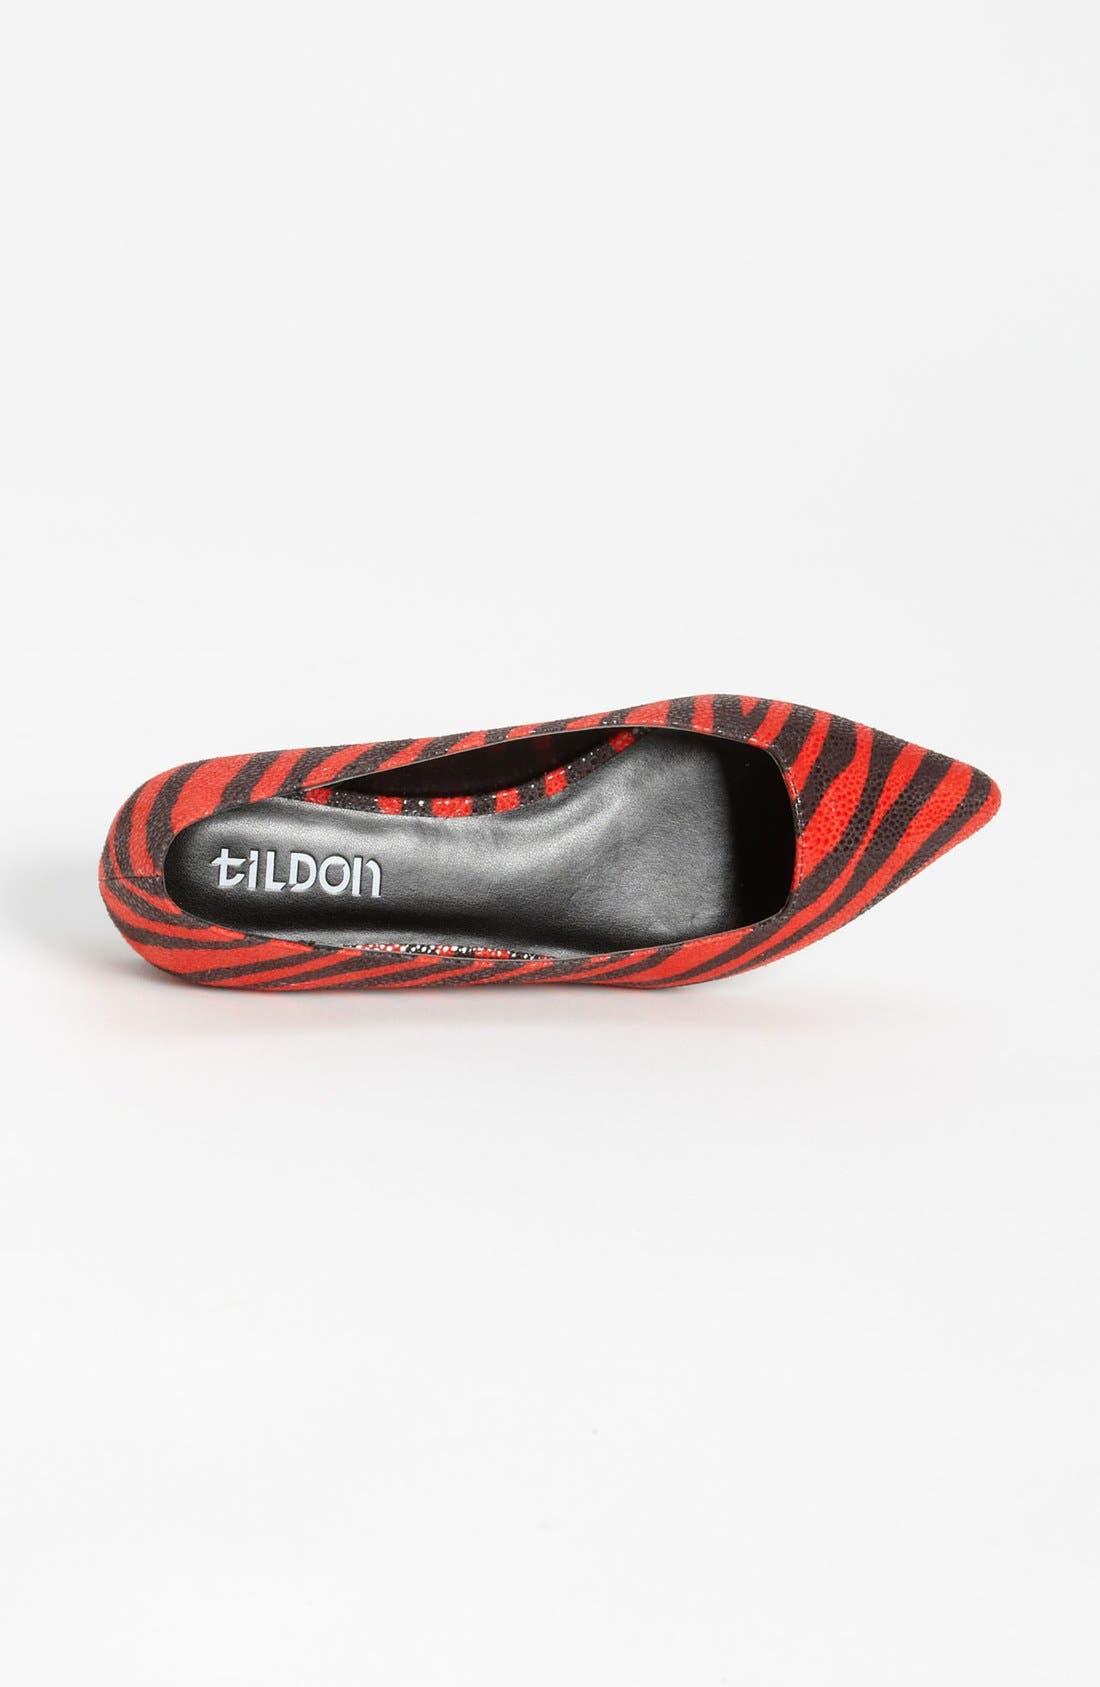 Alternate Image 3  - Tildon 'Dash' Flat